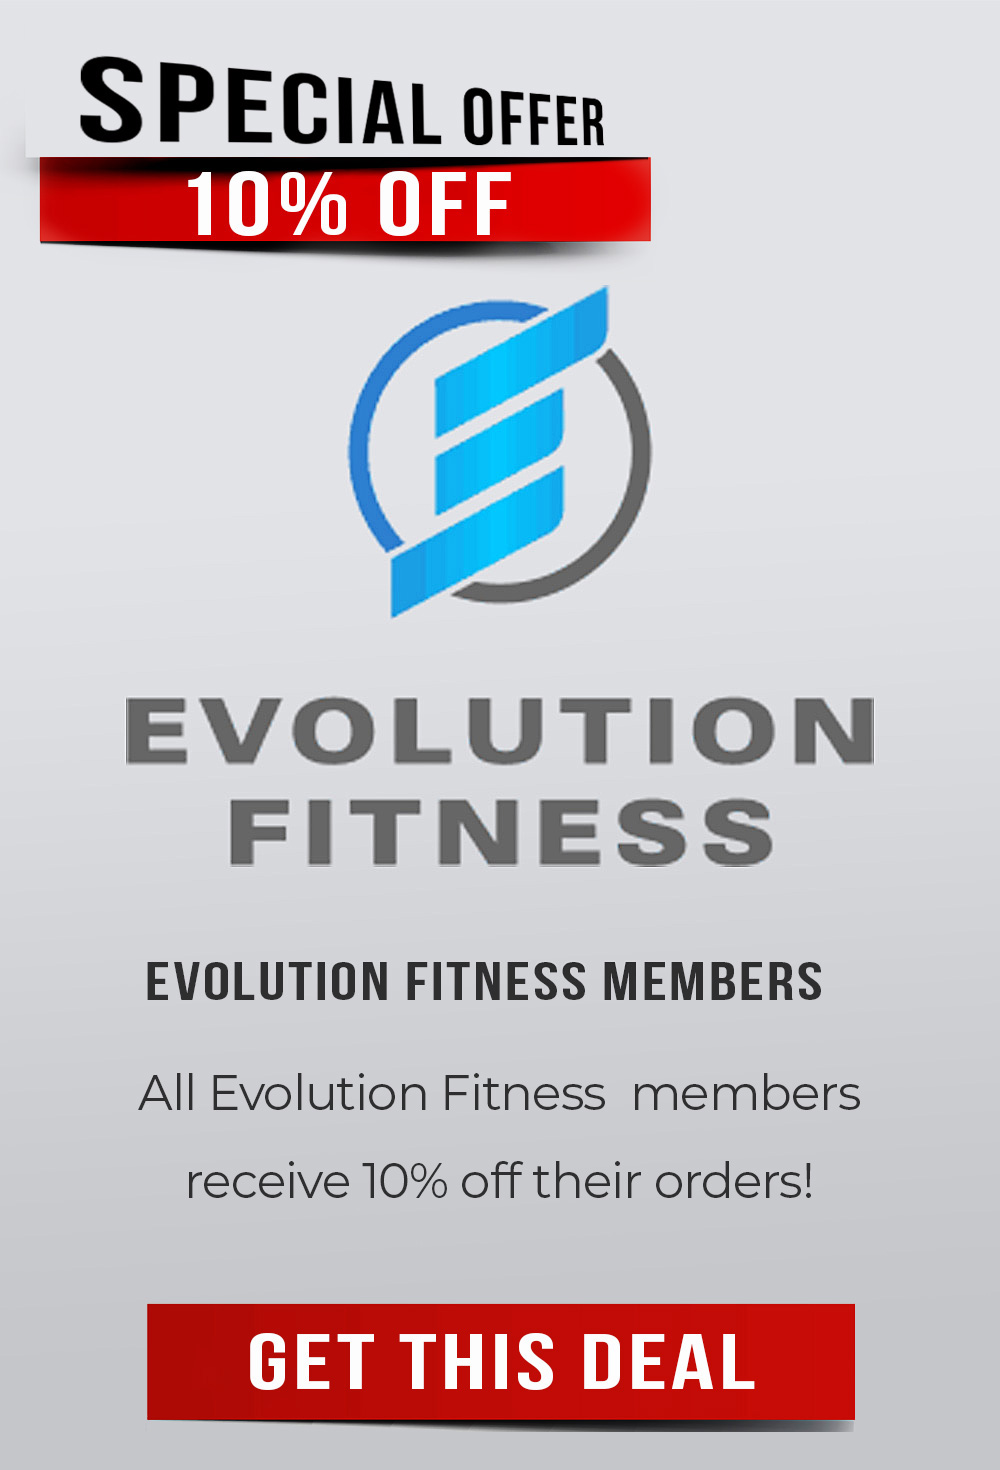 evolution-fitness-prairie-donair-discount.jpg